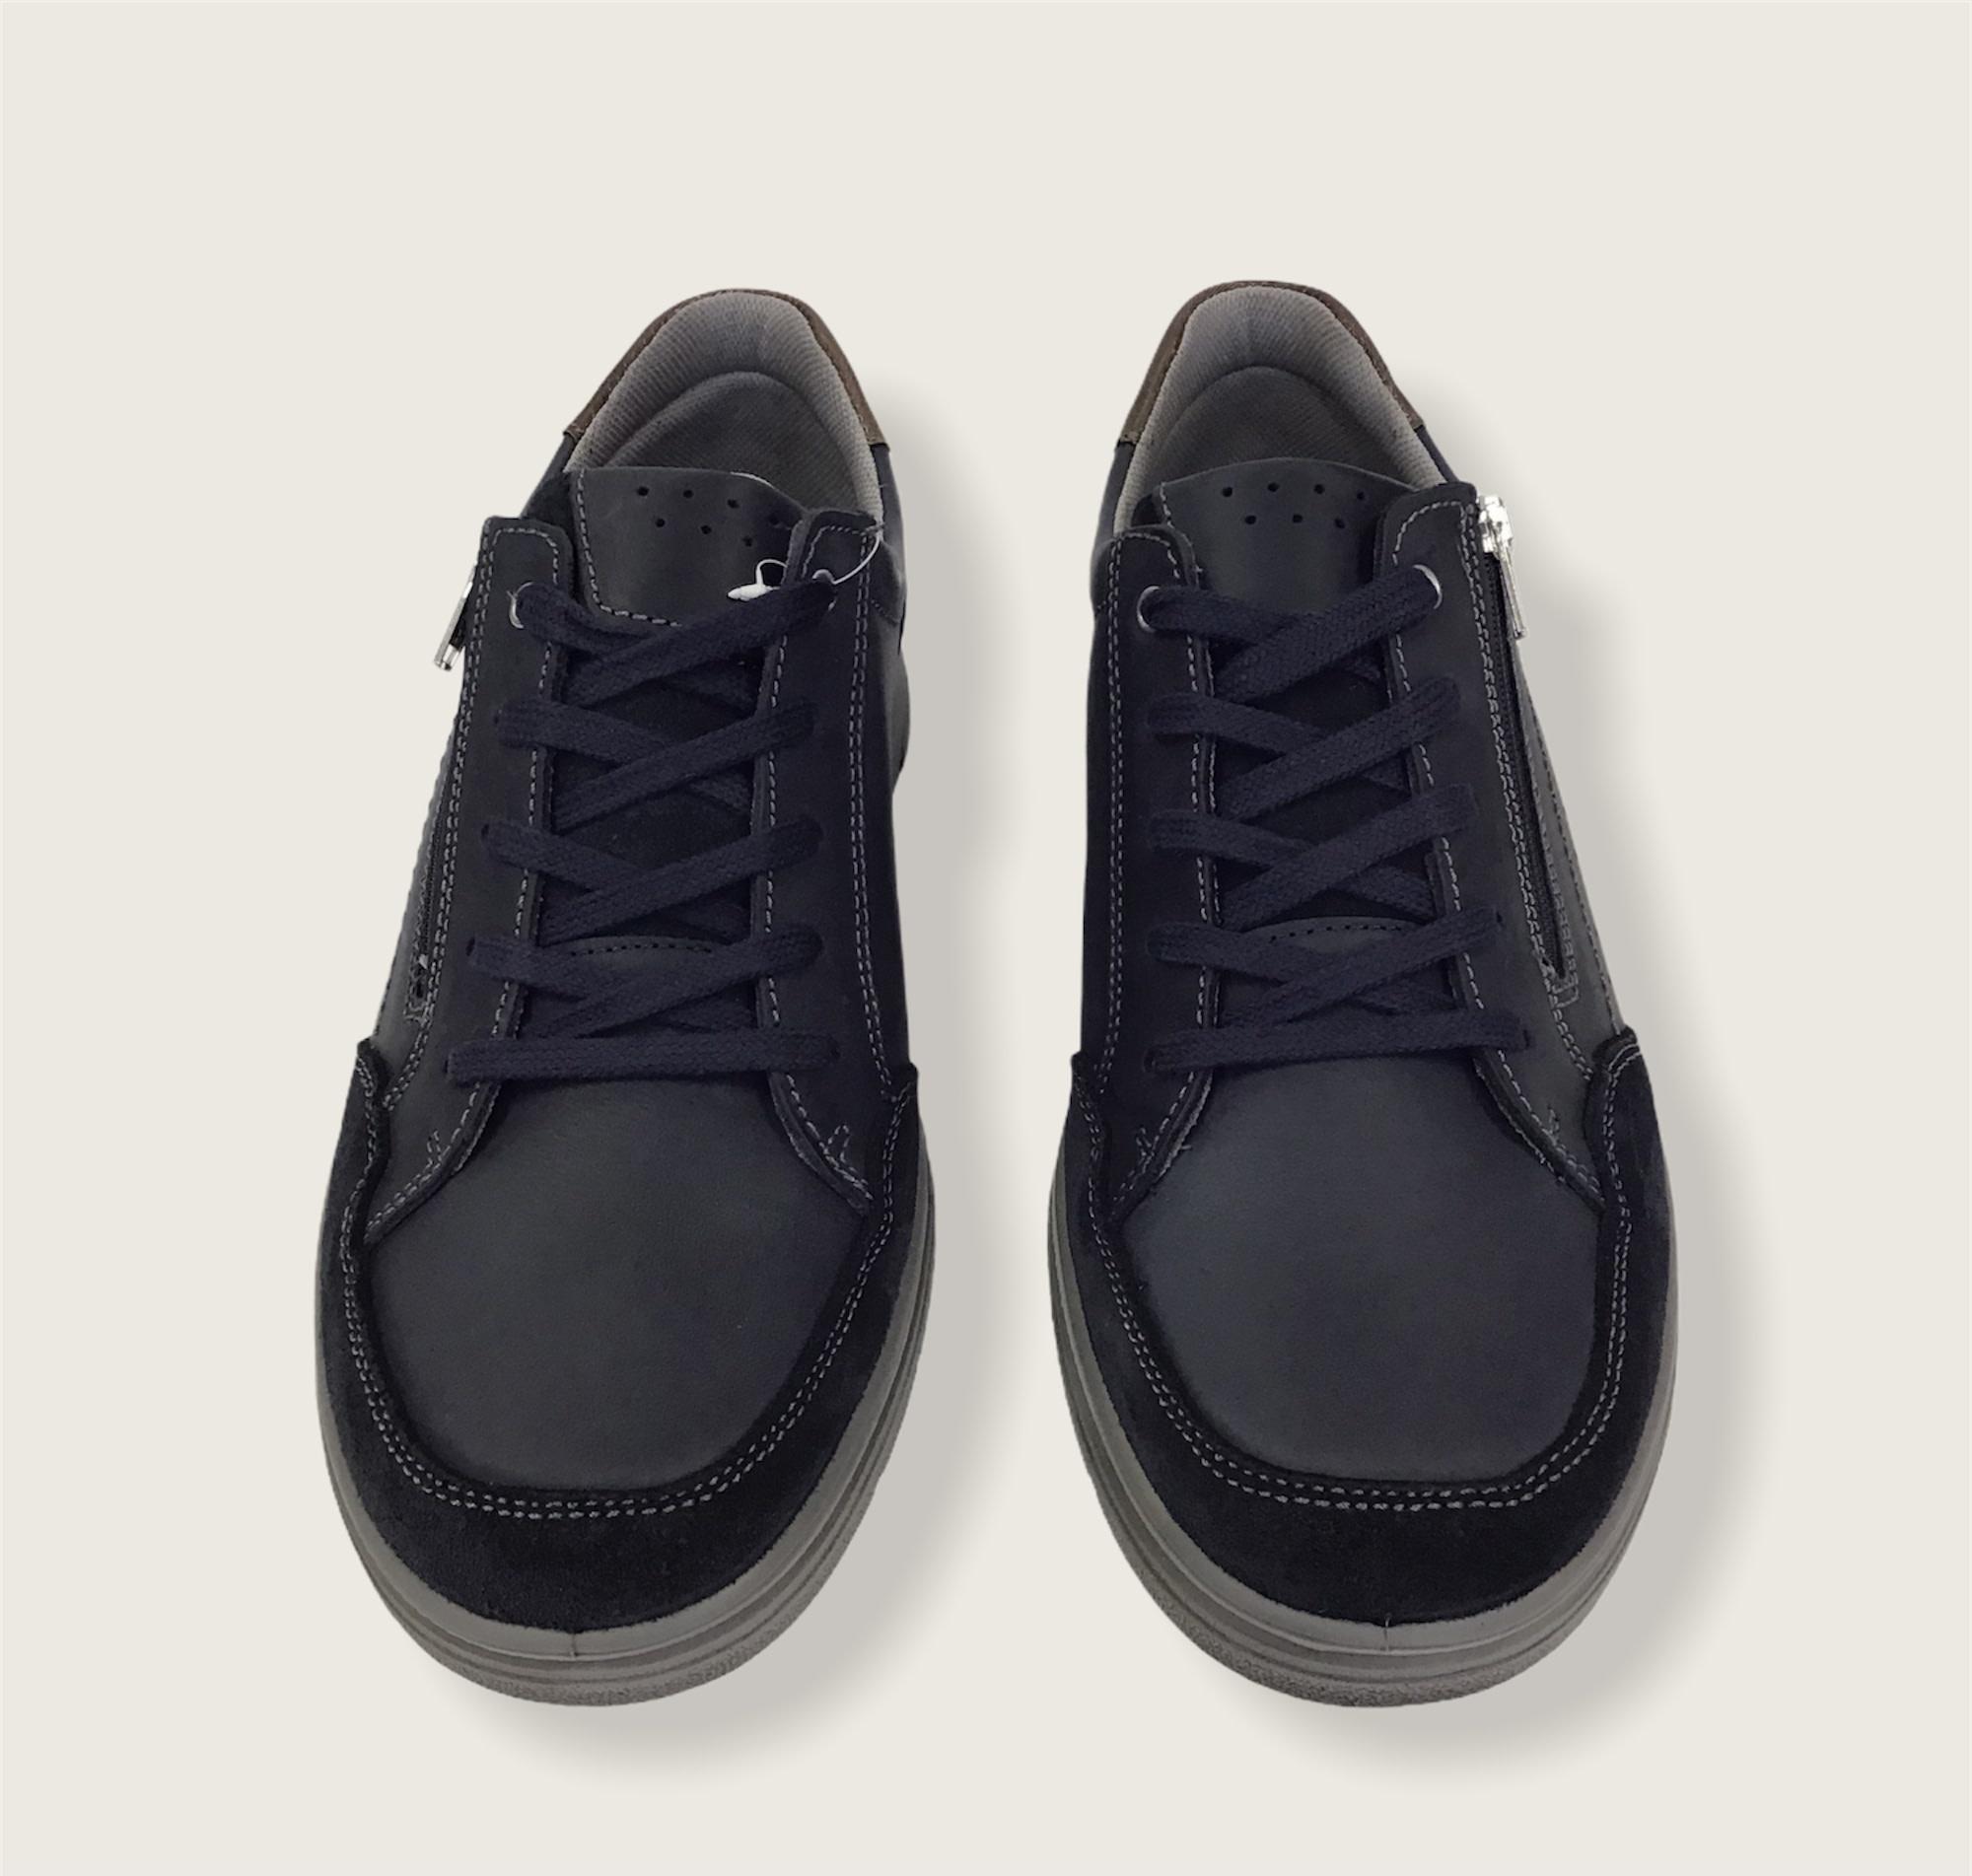 imac Imac 701060 shoe